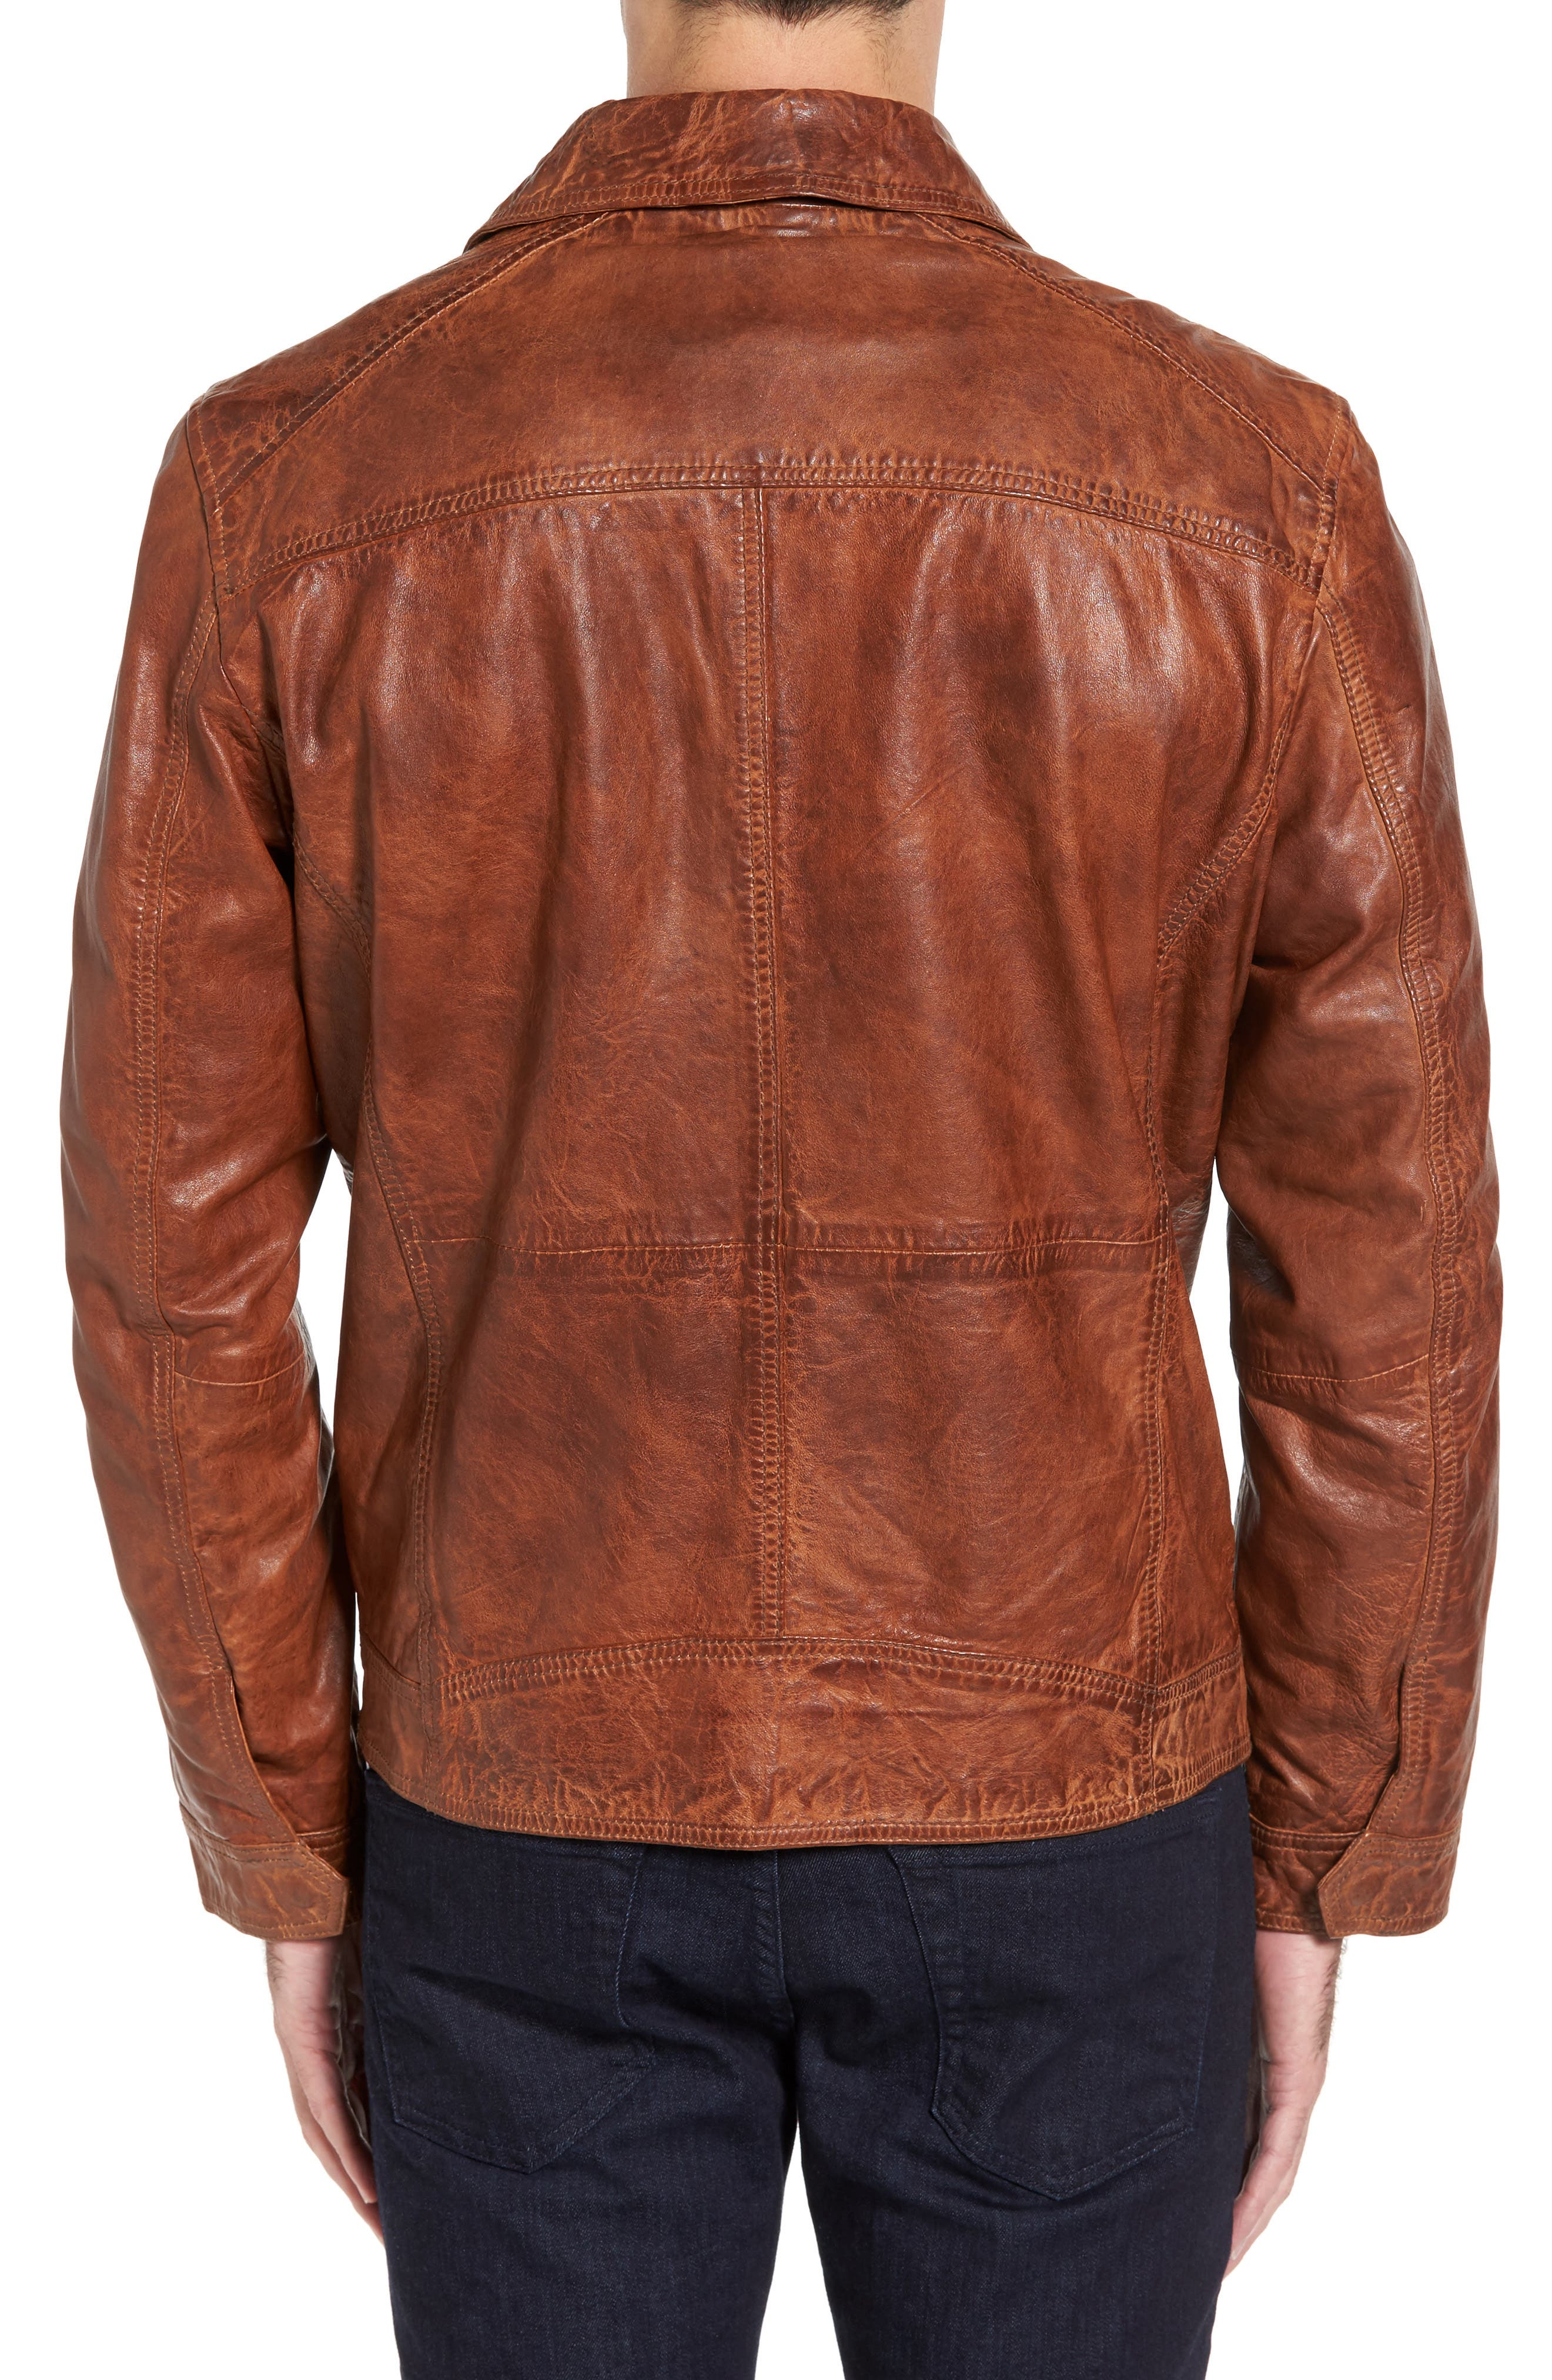 Washed Lamb Leather Jacket,                             Alternate thumbnail 2, color,                             Cognac